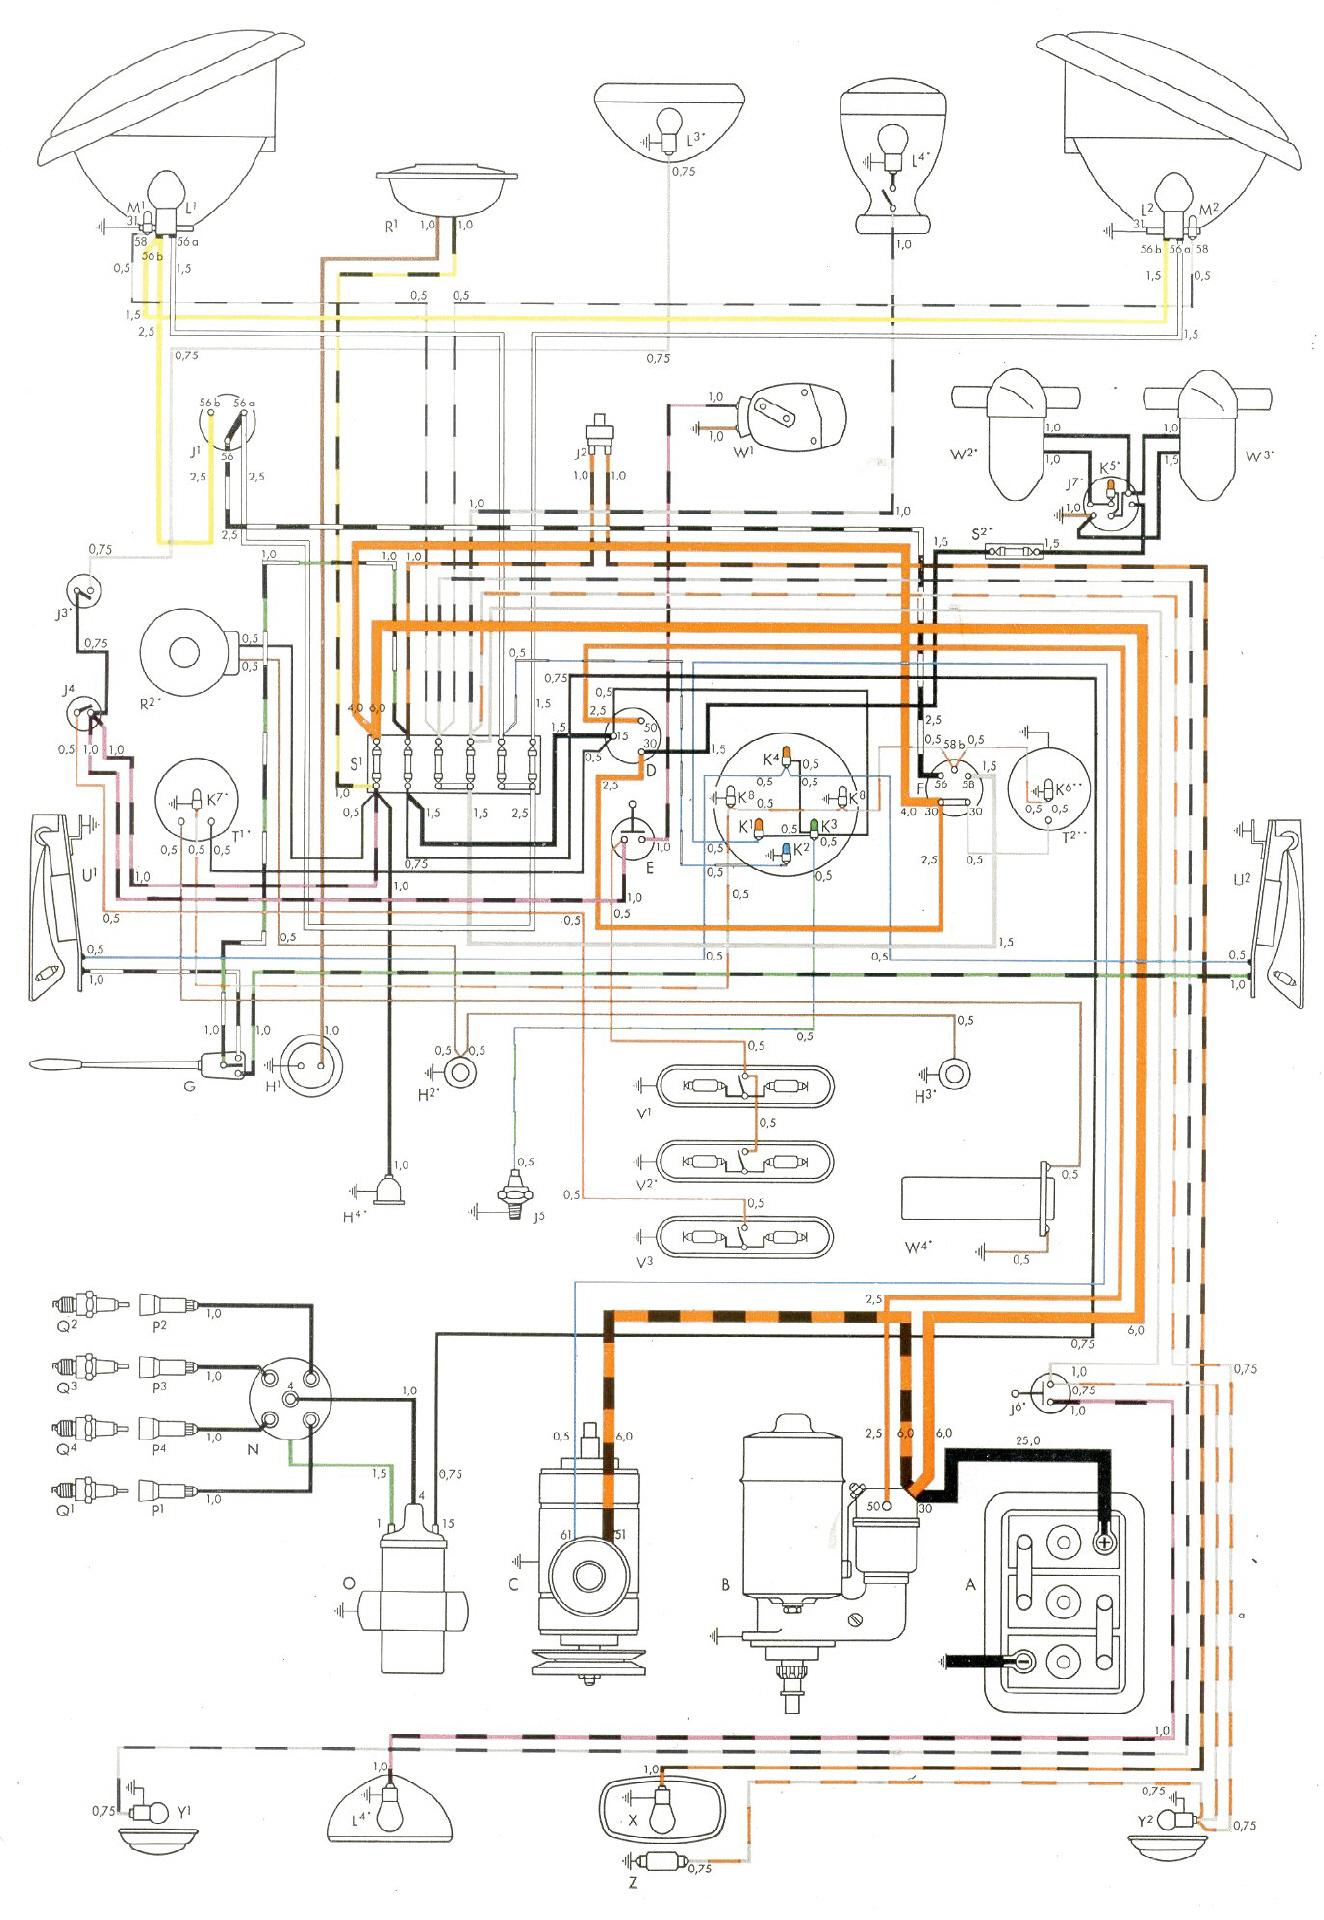 Ziemlich Drahtverstärker Diagramm Ideen - Schaltplan Serie Circuit ...